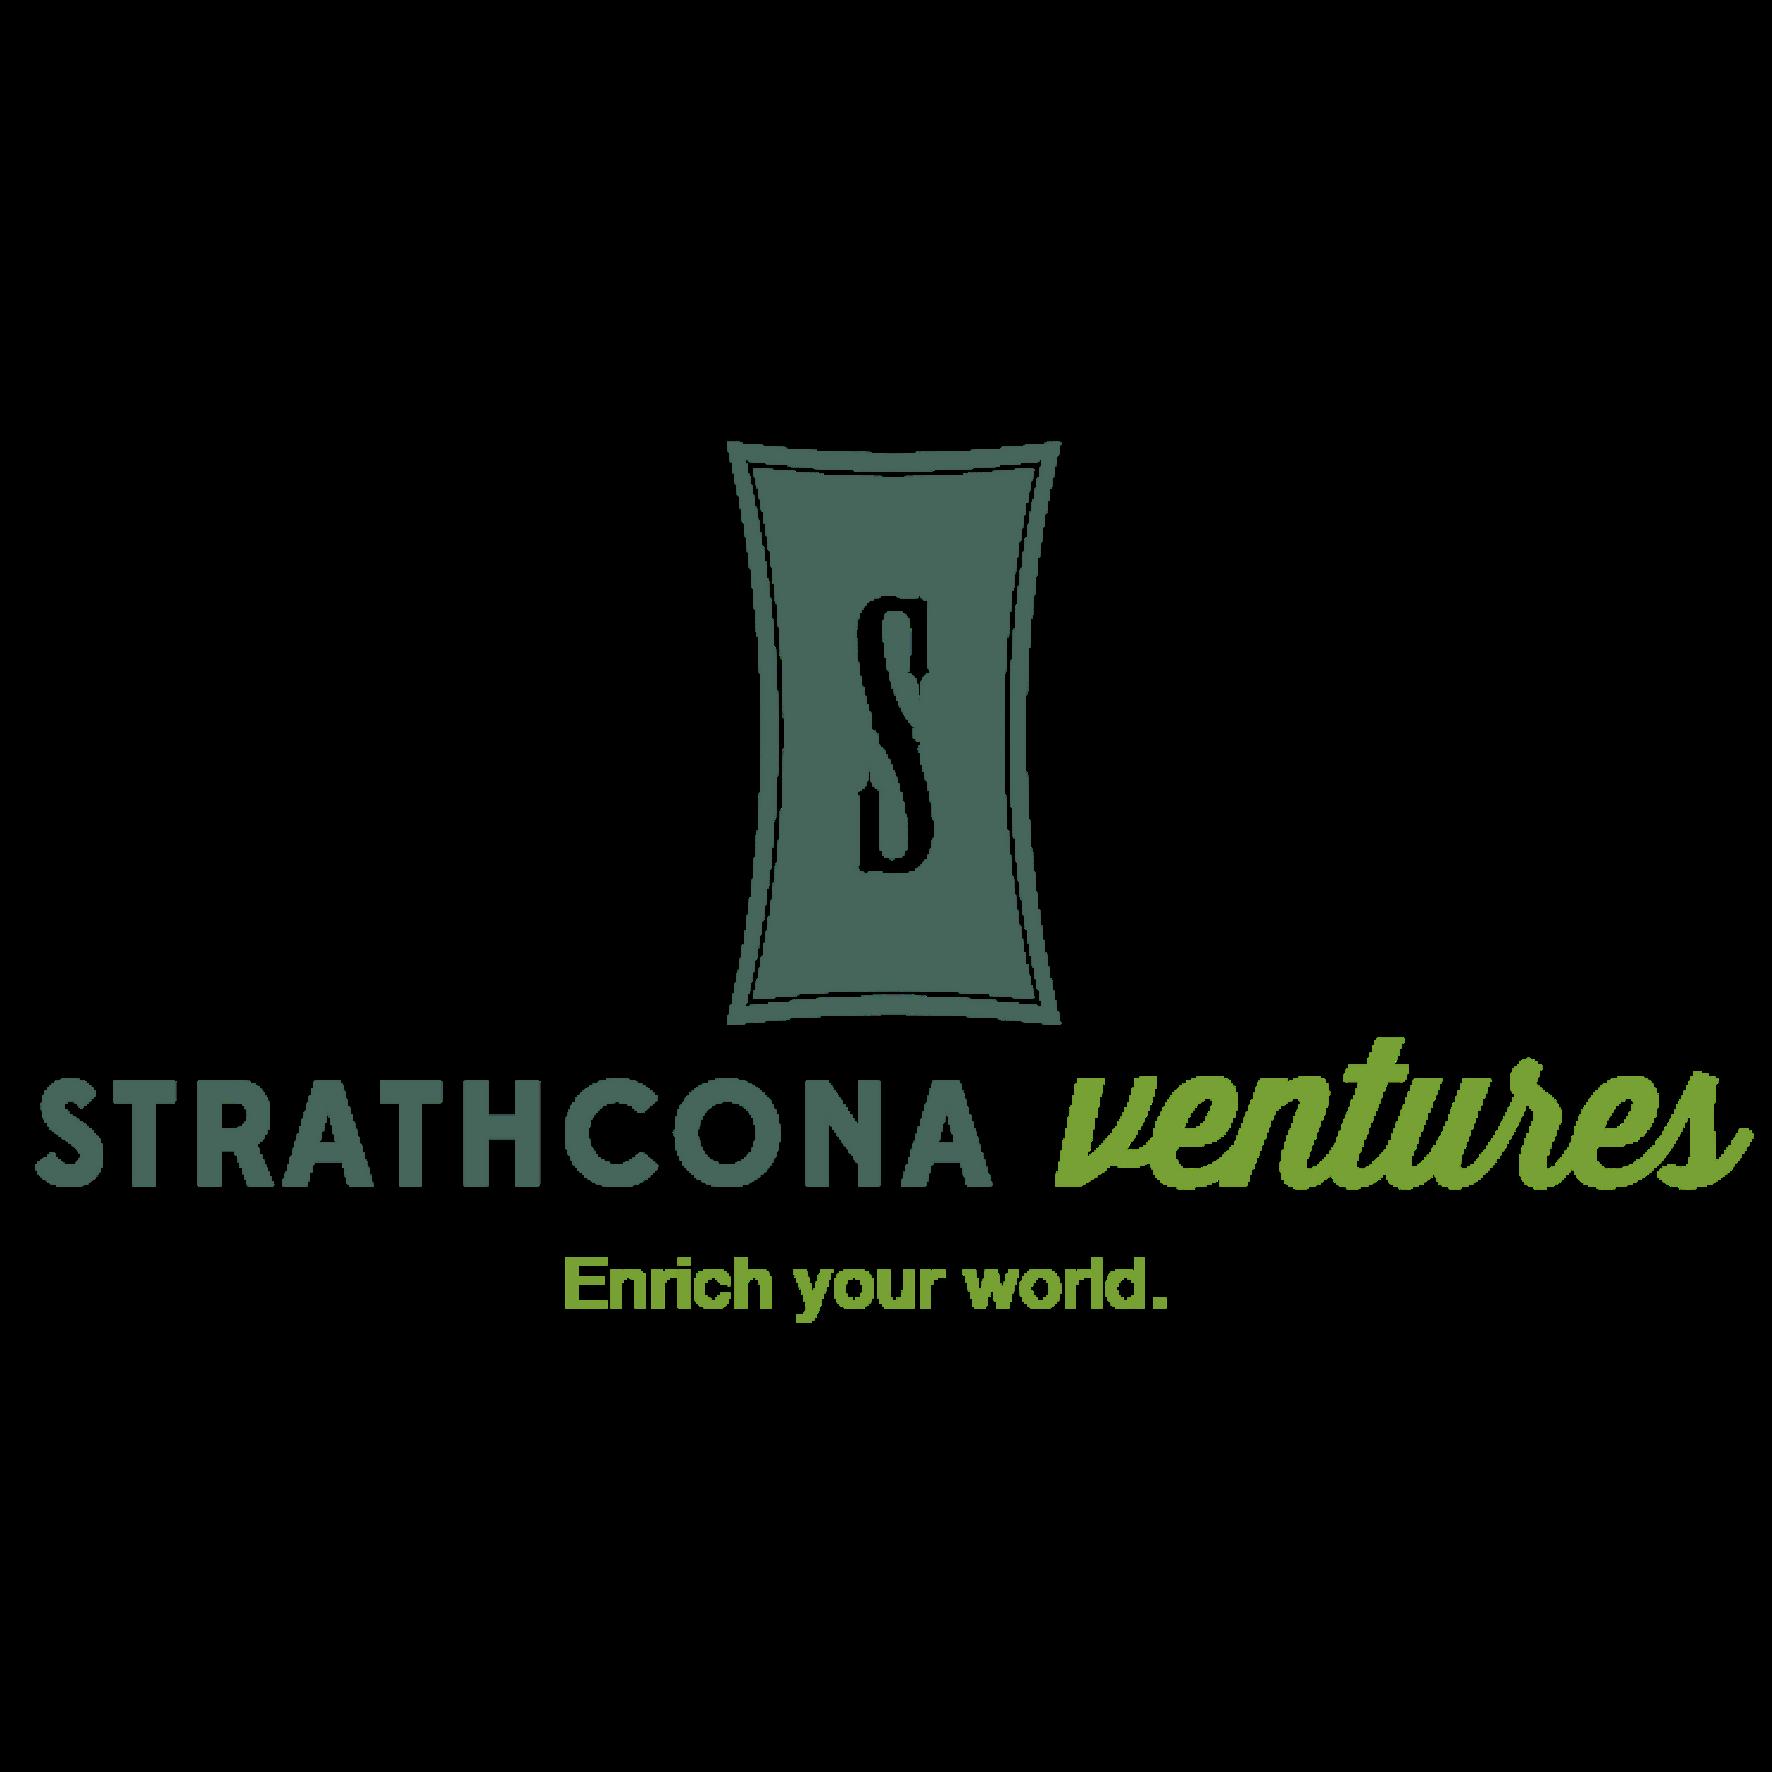 Strathcona Ventures